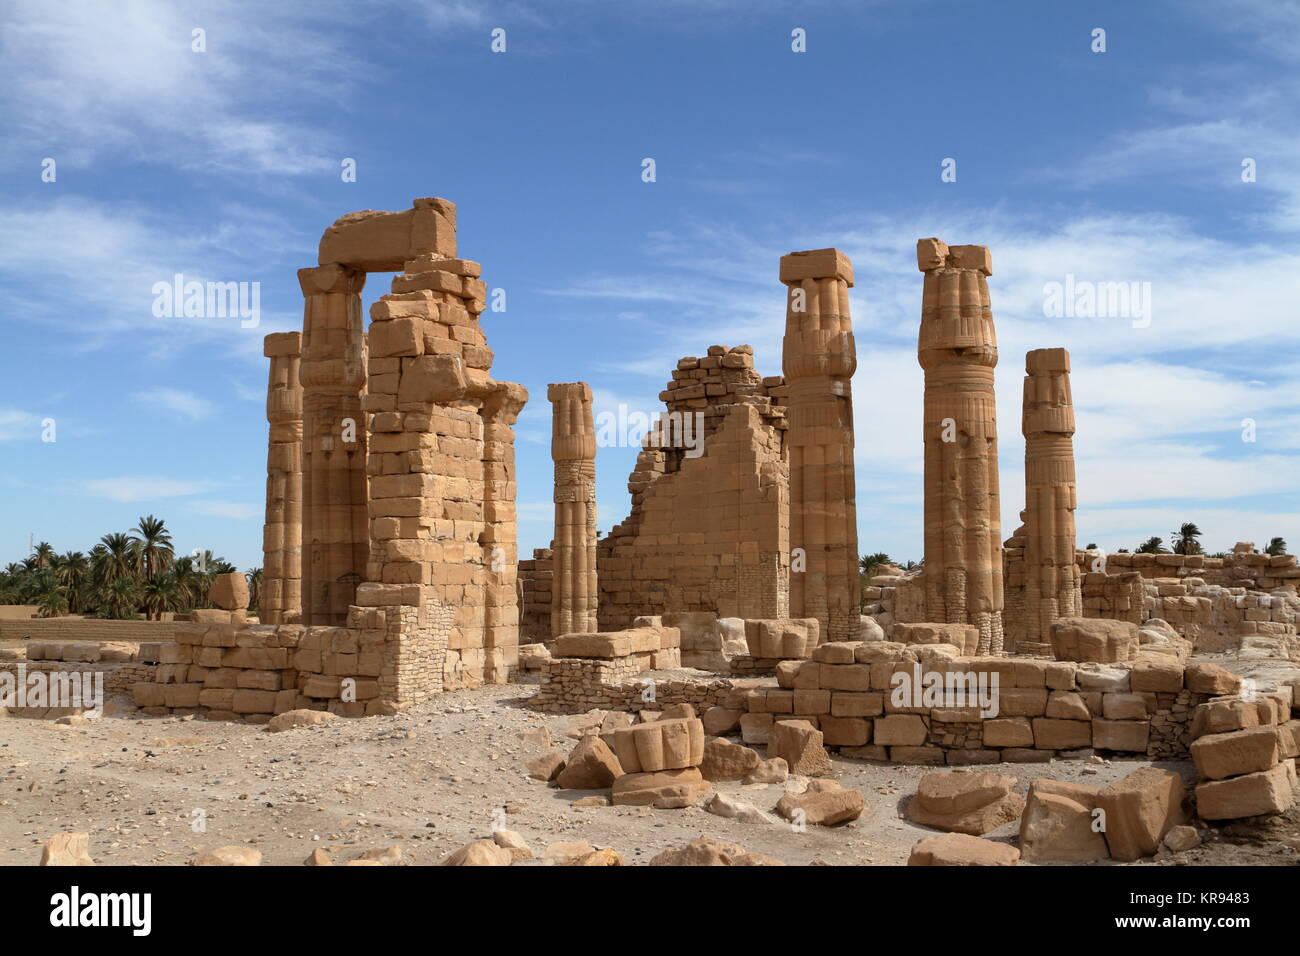 the temple ruins of soleb in sudan Stock Photo